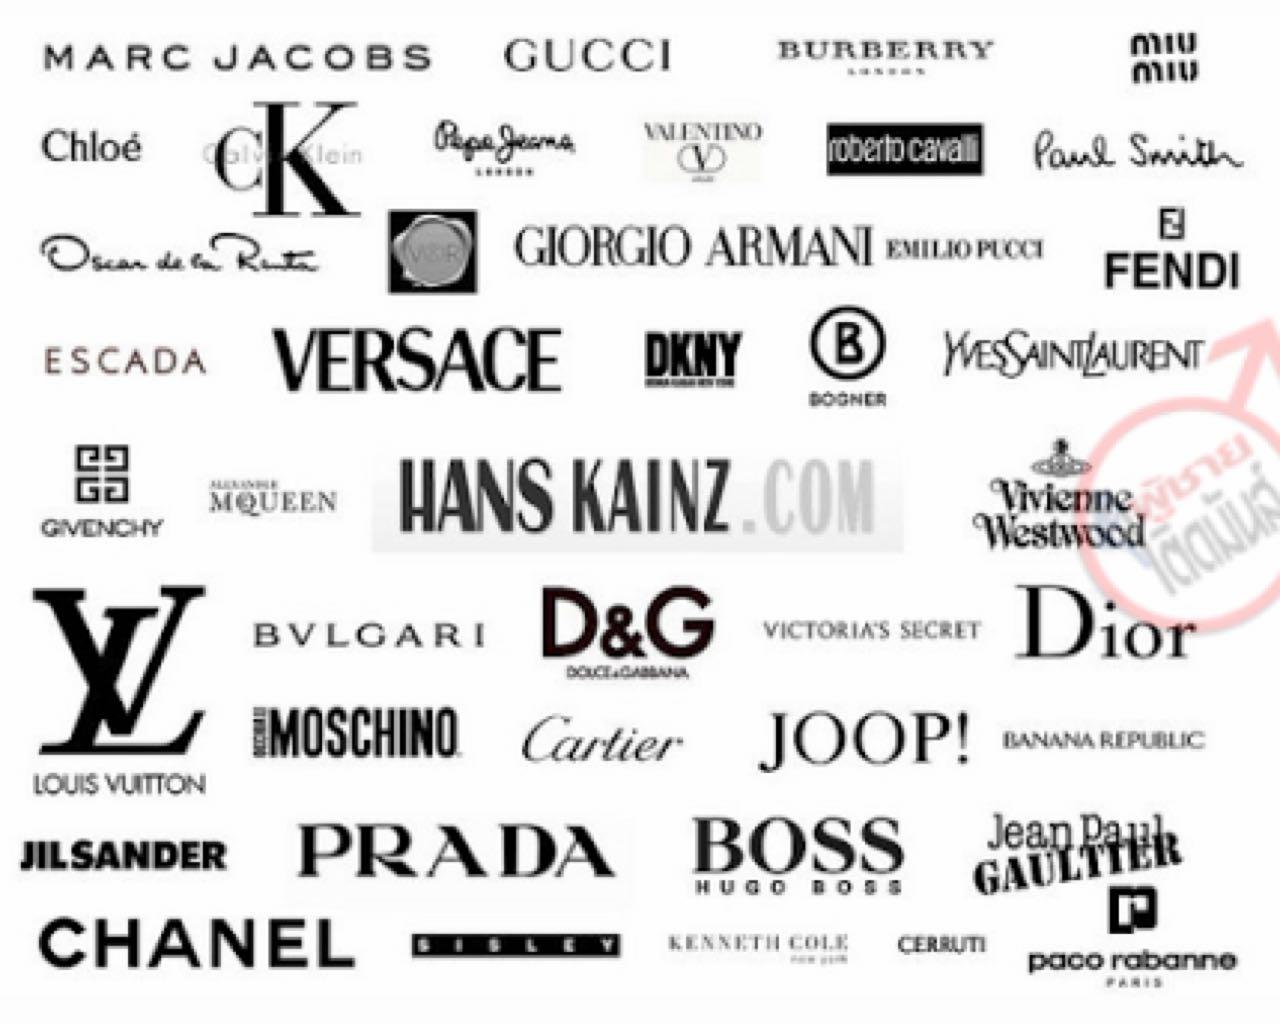 Yves Saint Laurent - Fashion Designer 37